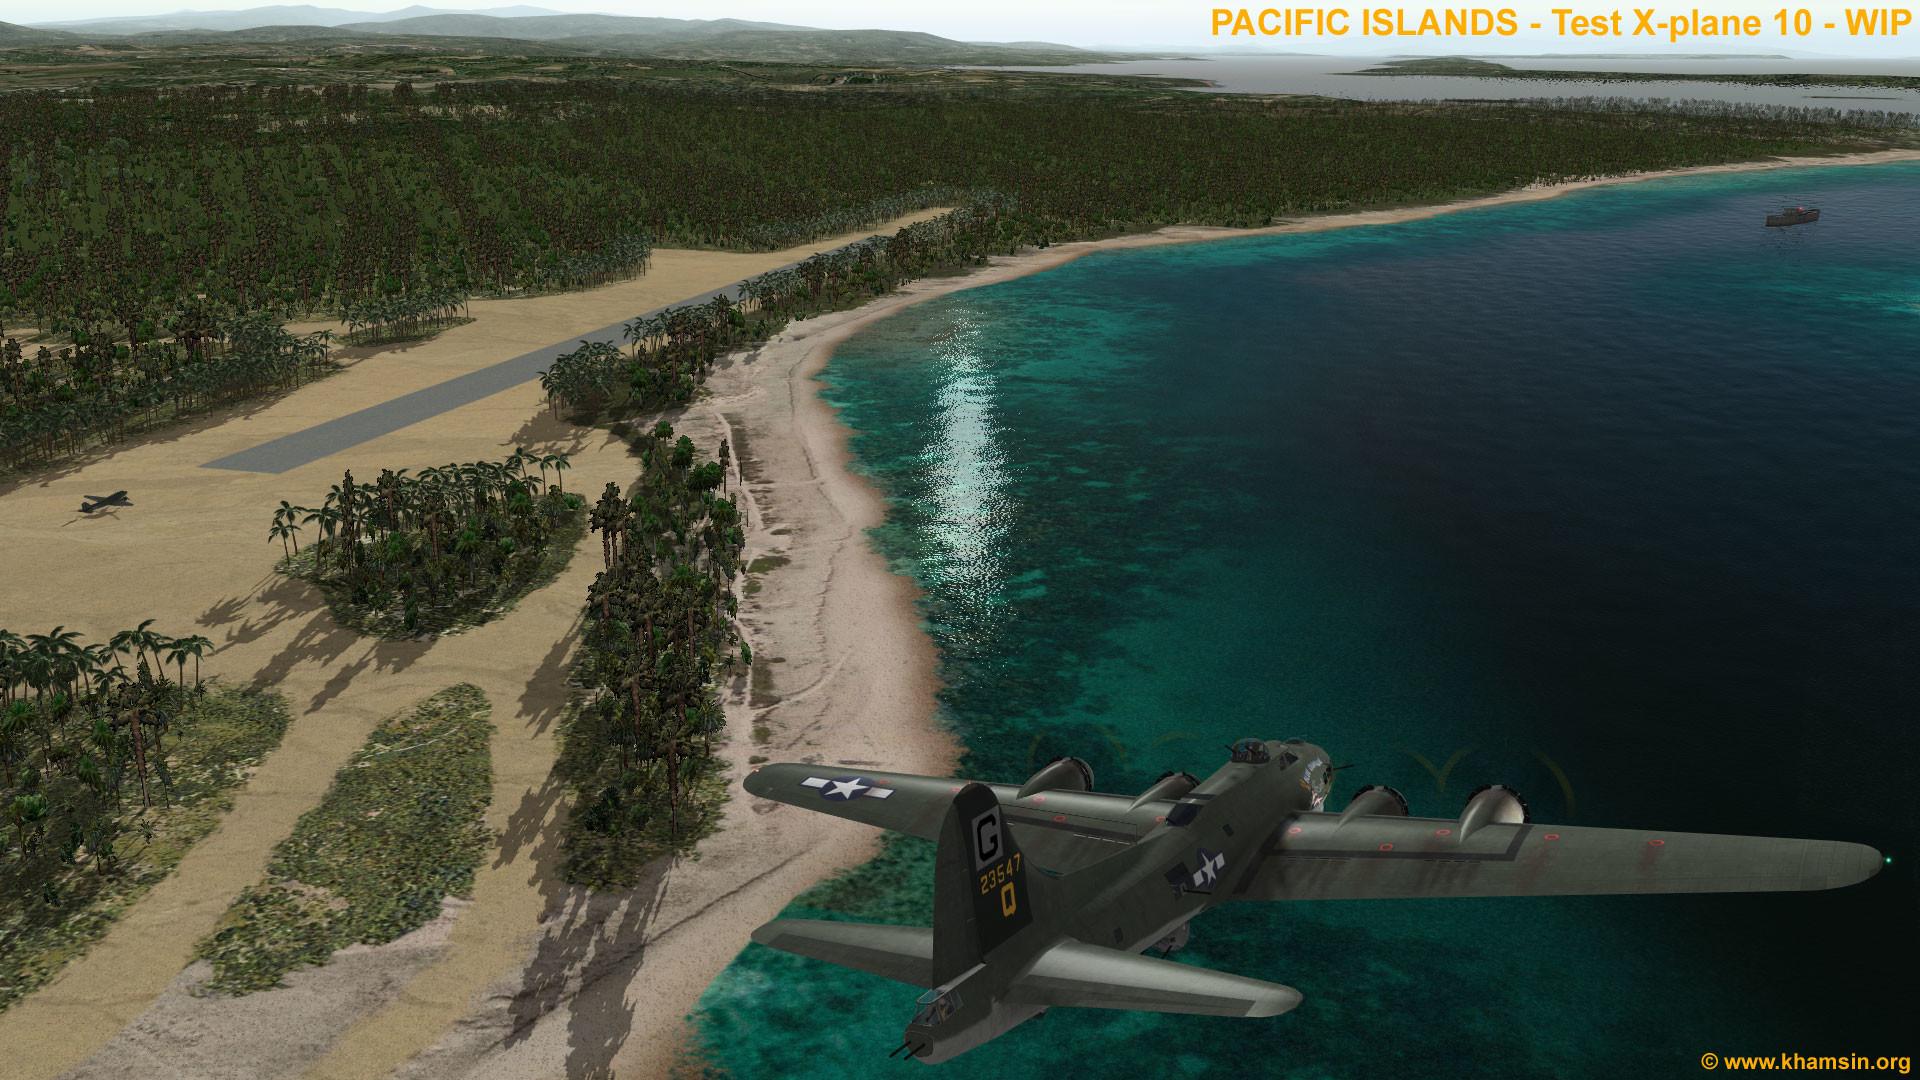 Res: 1920x1080, Pacific islands WW2 - Munda Airfield - Pacific Islands Airfields -  X-Plane.Org Forum